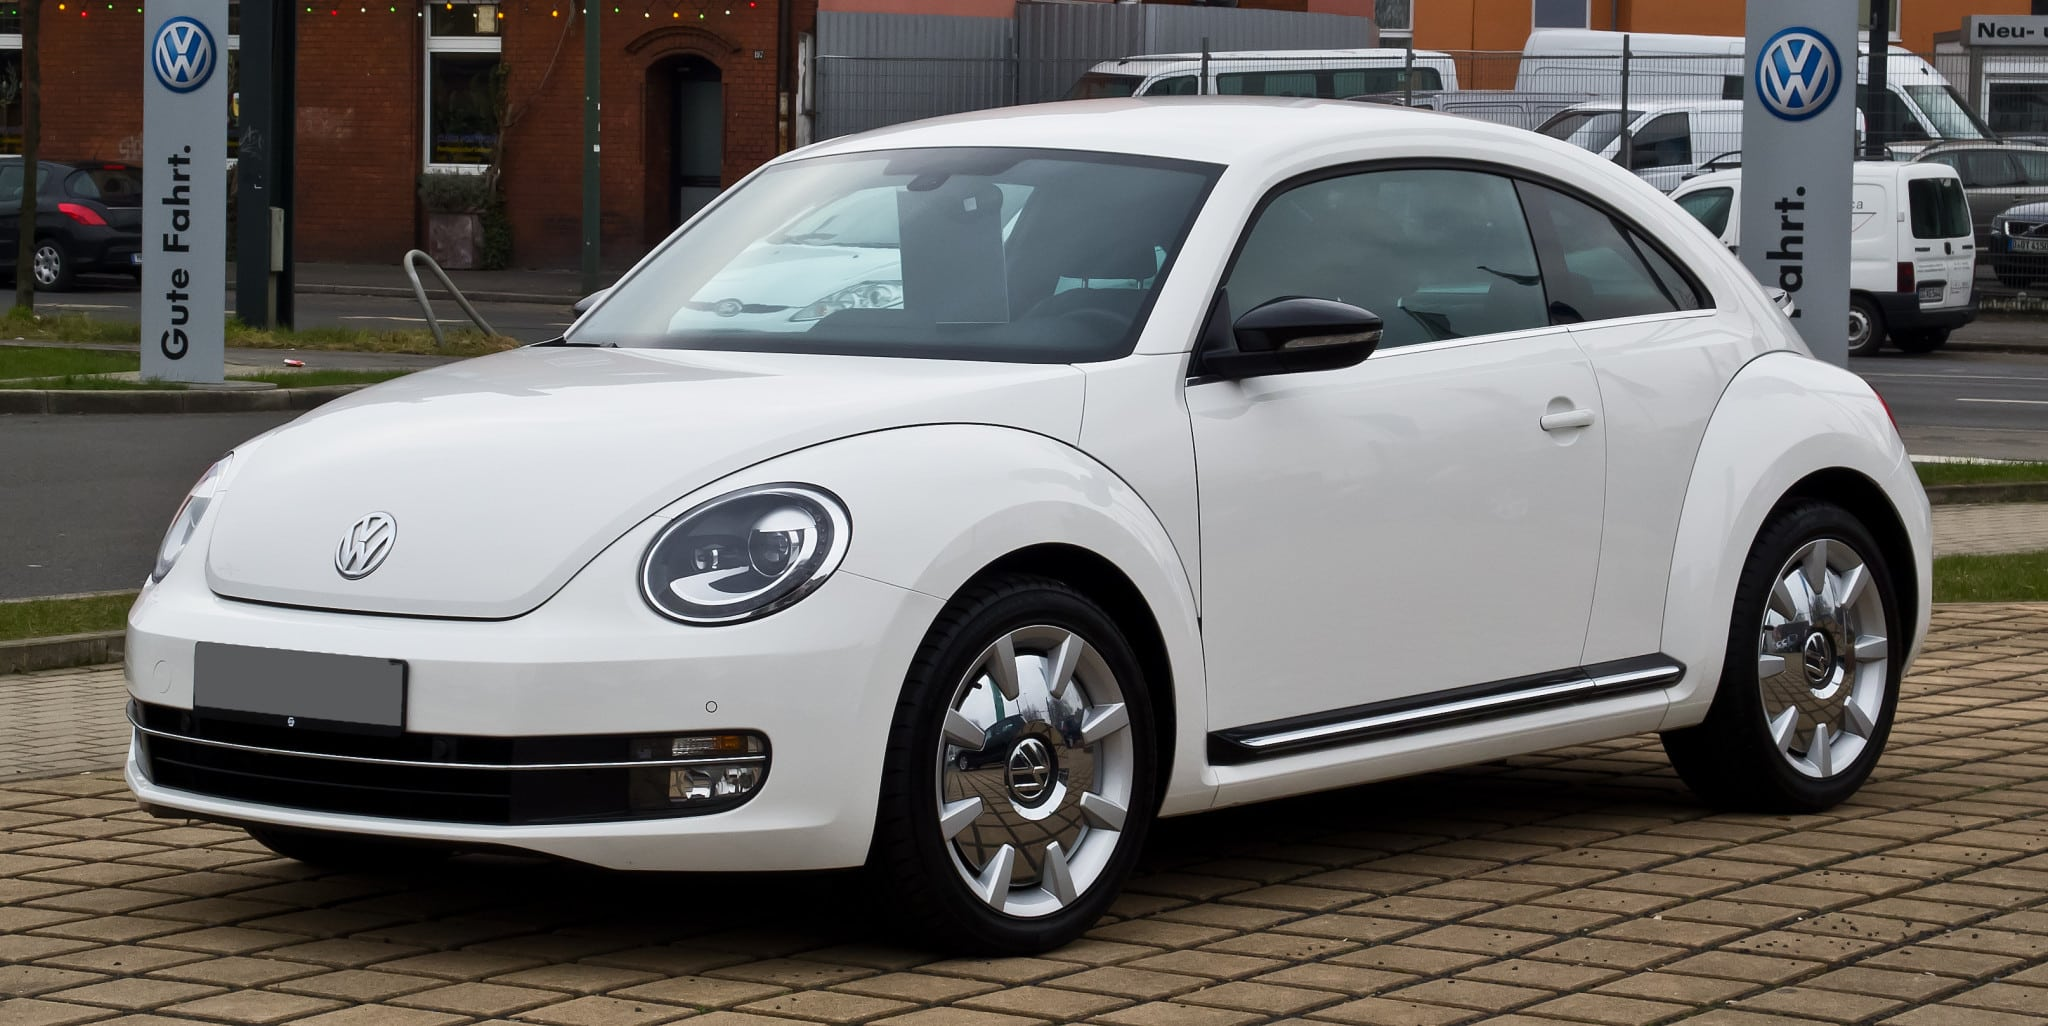 VW_Beetle_1.4_TSI_Sport_–_Frontansicht,_3._März_2013,_Düsseldorf